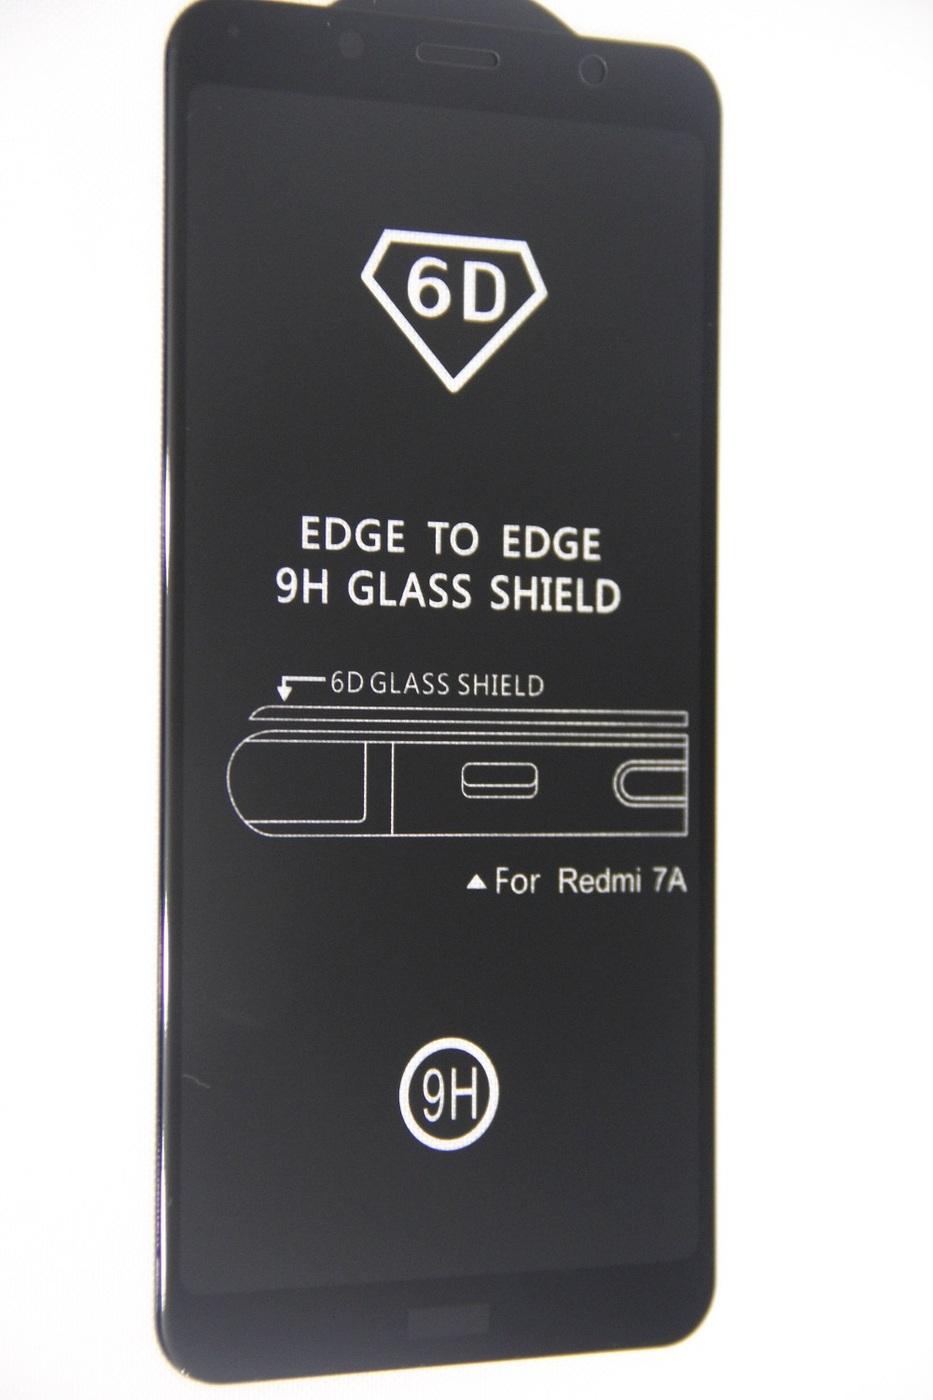 Защитное закаленное стекло Xiaomi Redmi 7 А EDGE TO EDGE 9H Glass Shield 6D Нет бренда  100072 цена 449 руб. Купить на OZON